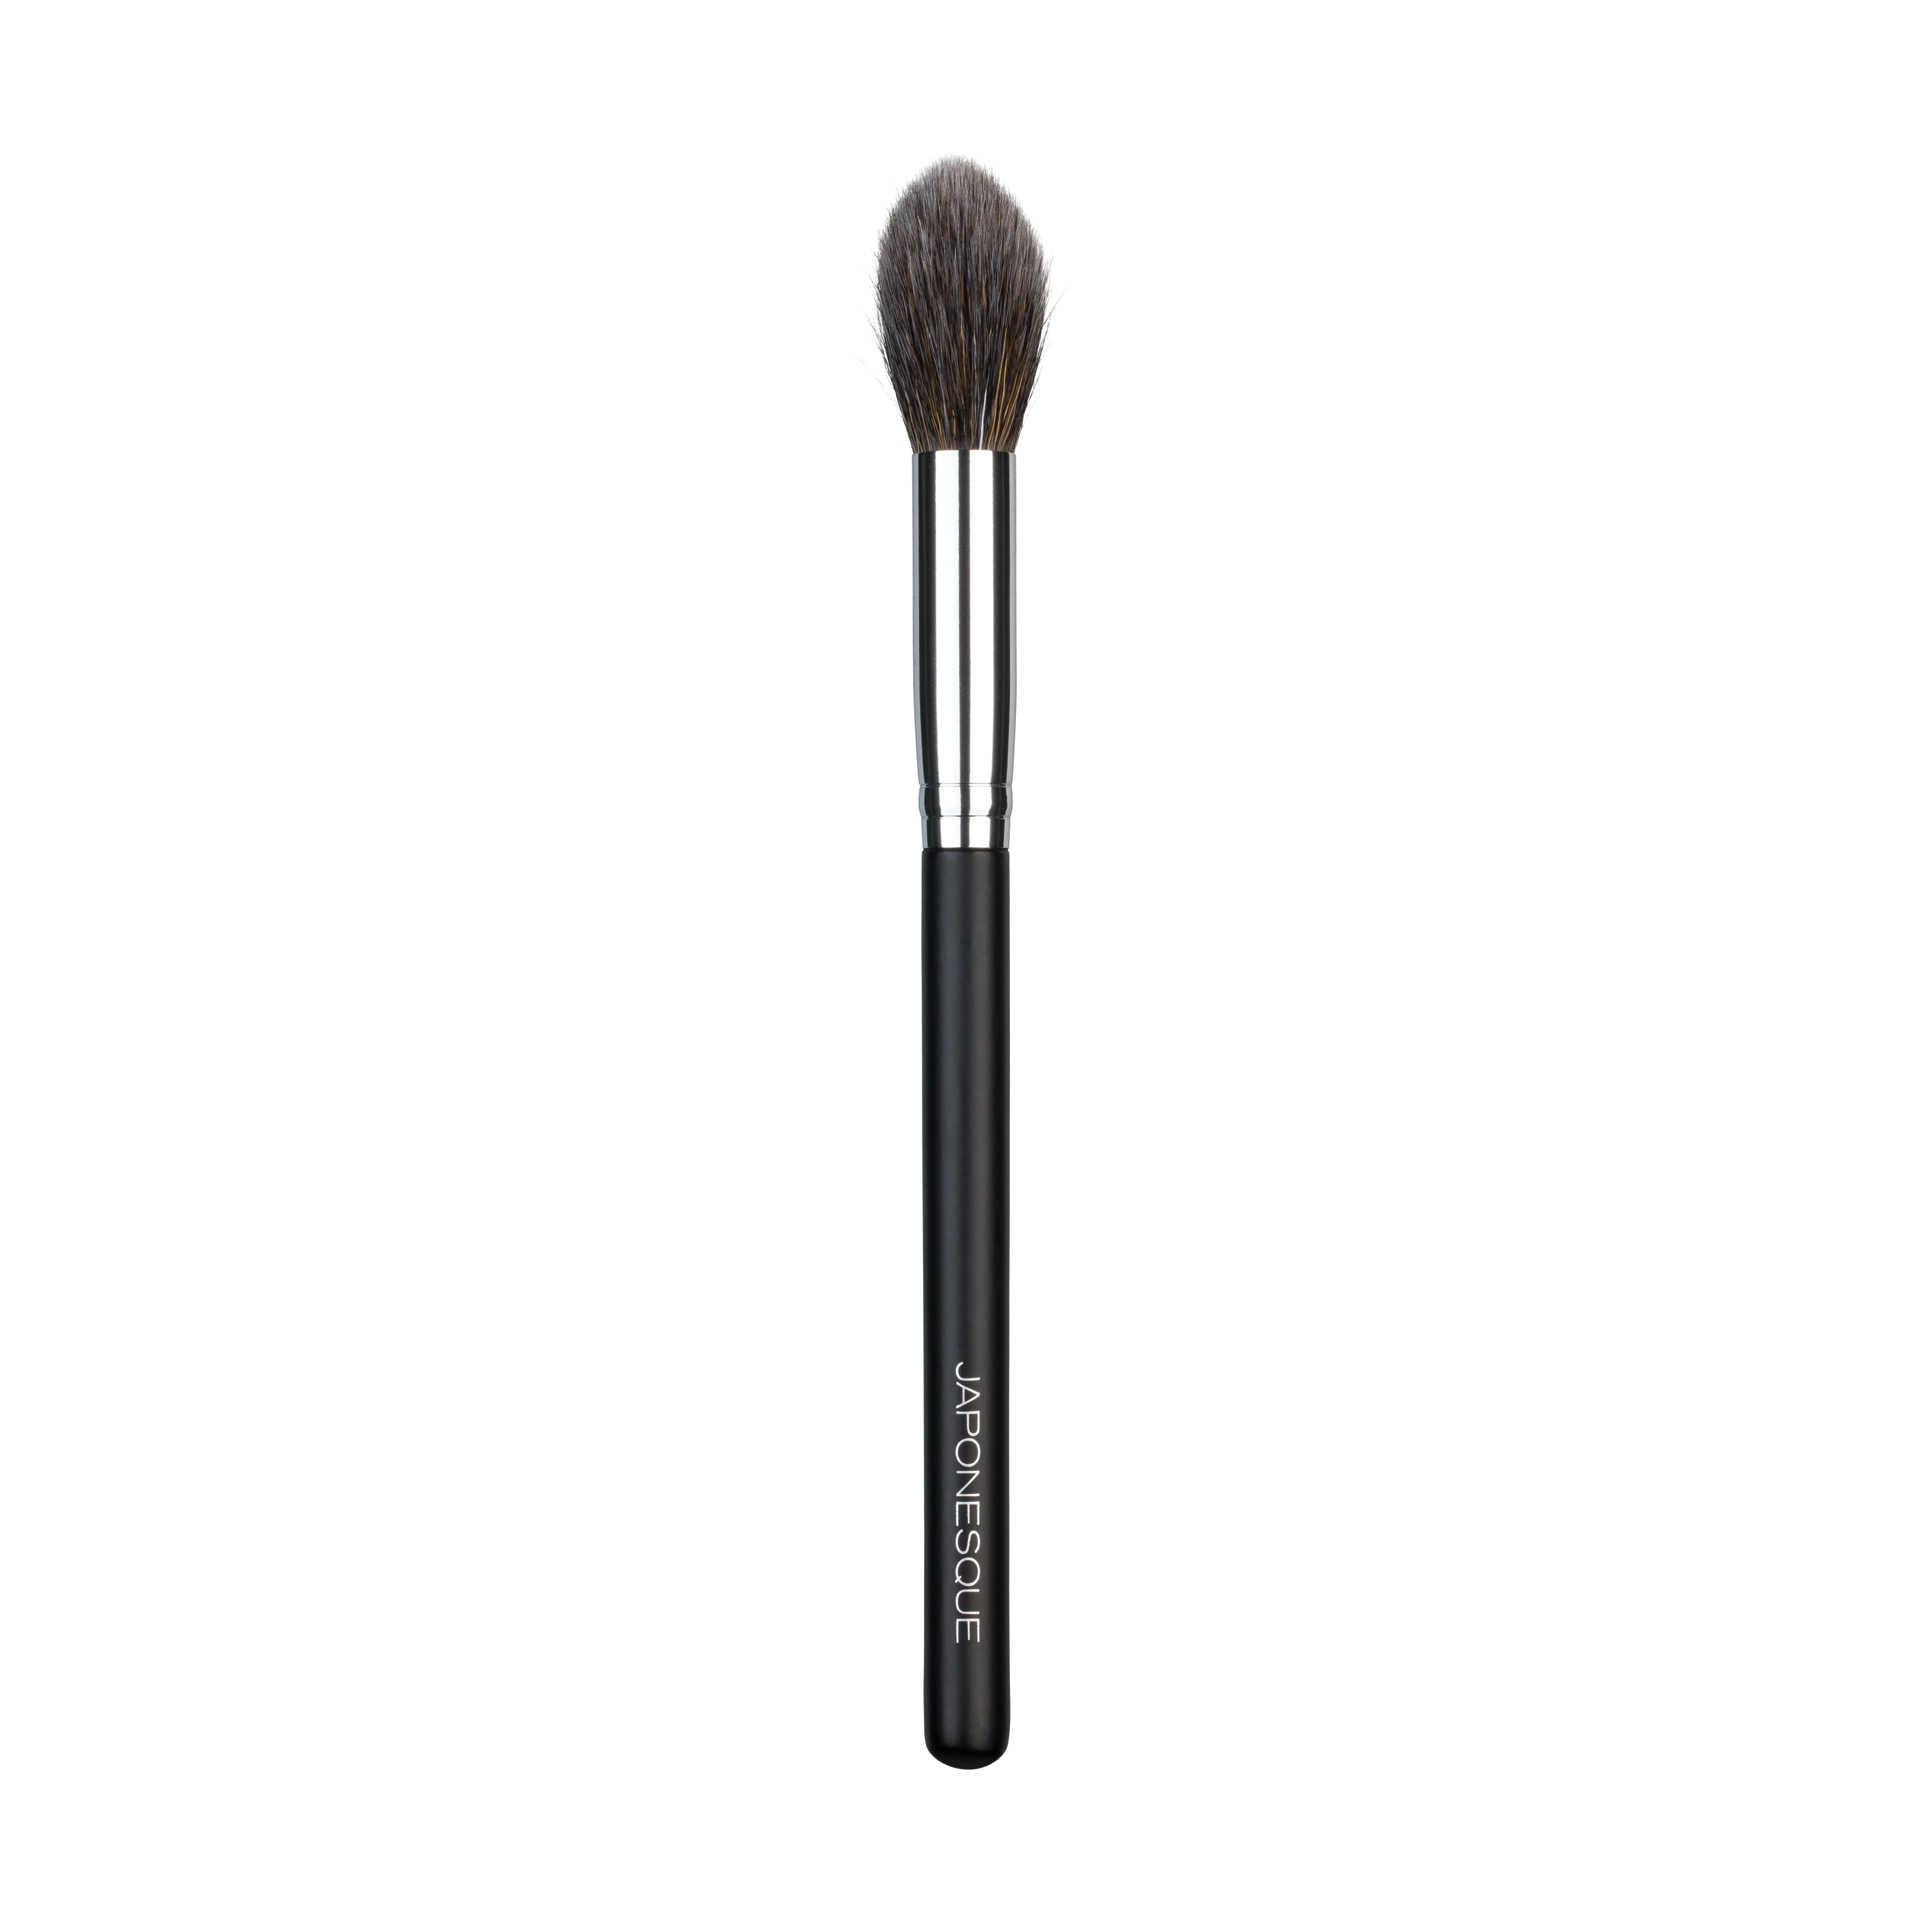 Slanted Powder Brush by japonesque #21